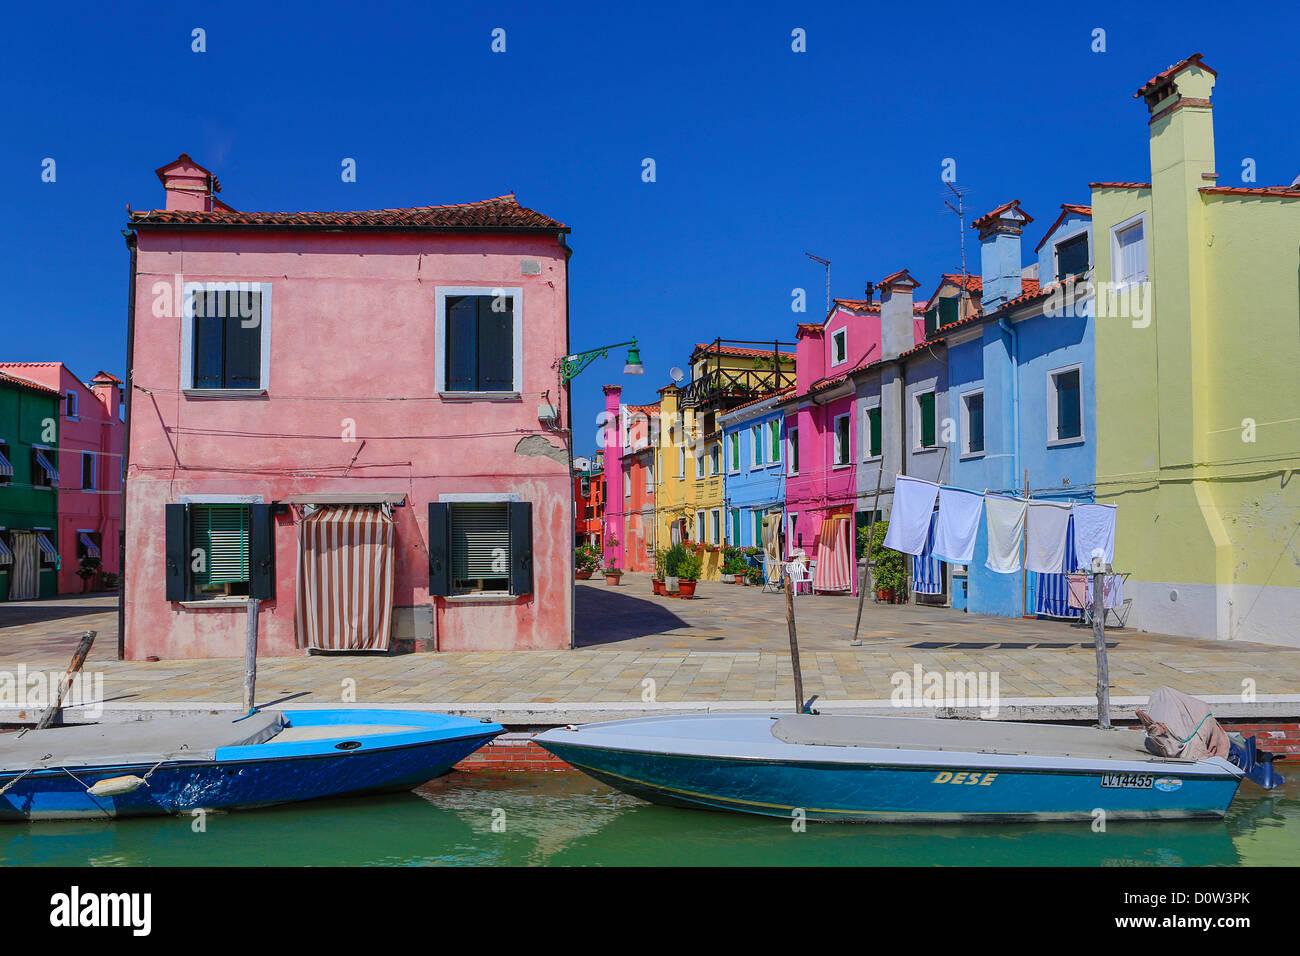 Italia, Europa, viajes, Burano, arquitectura, barcos, canal, coloridos, colores, turismo, Venecia Imagen De Stock